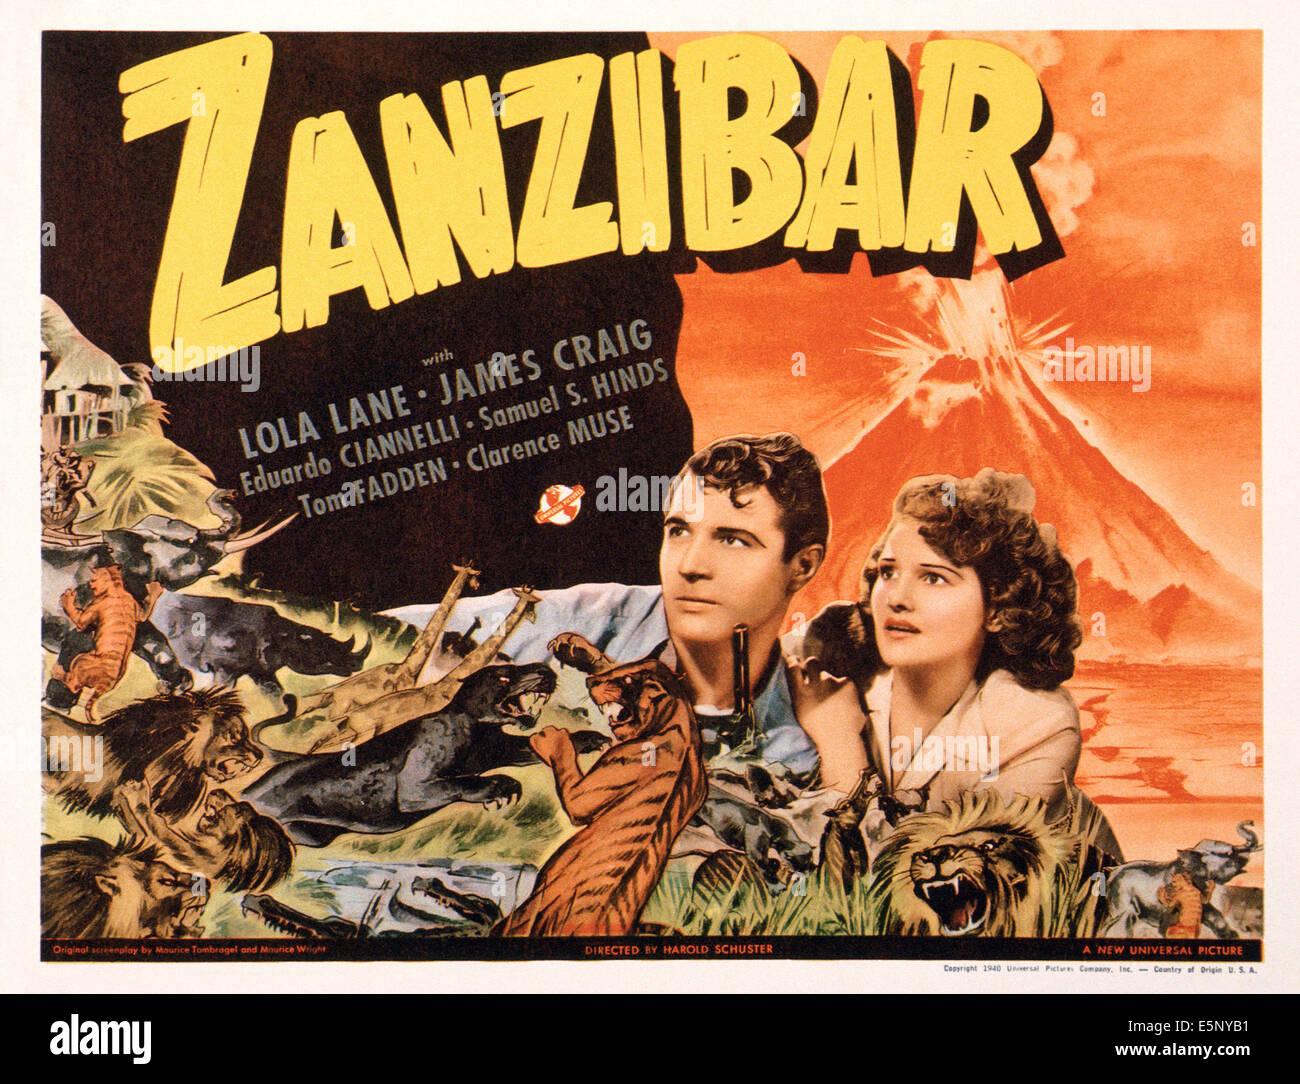 zanzibar-us-lobbycard-from-left-james-craig-lola-lane-1940-E5NYB1.jpg